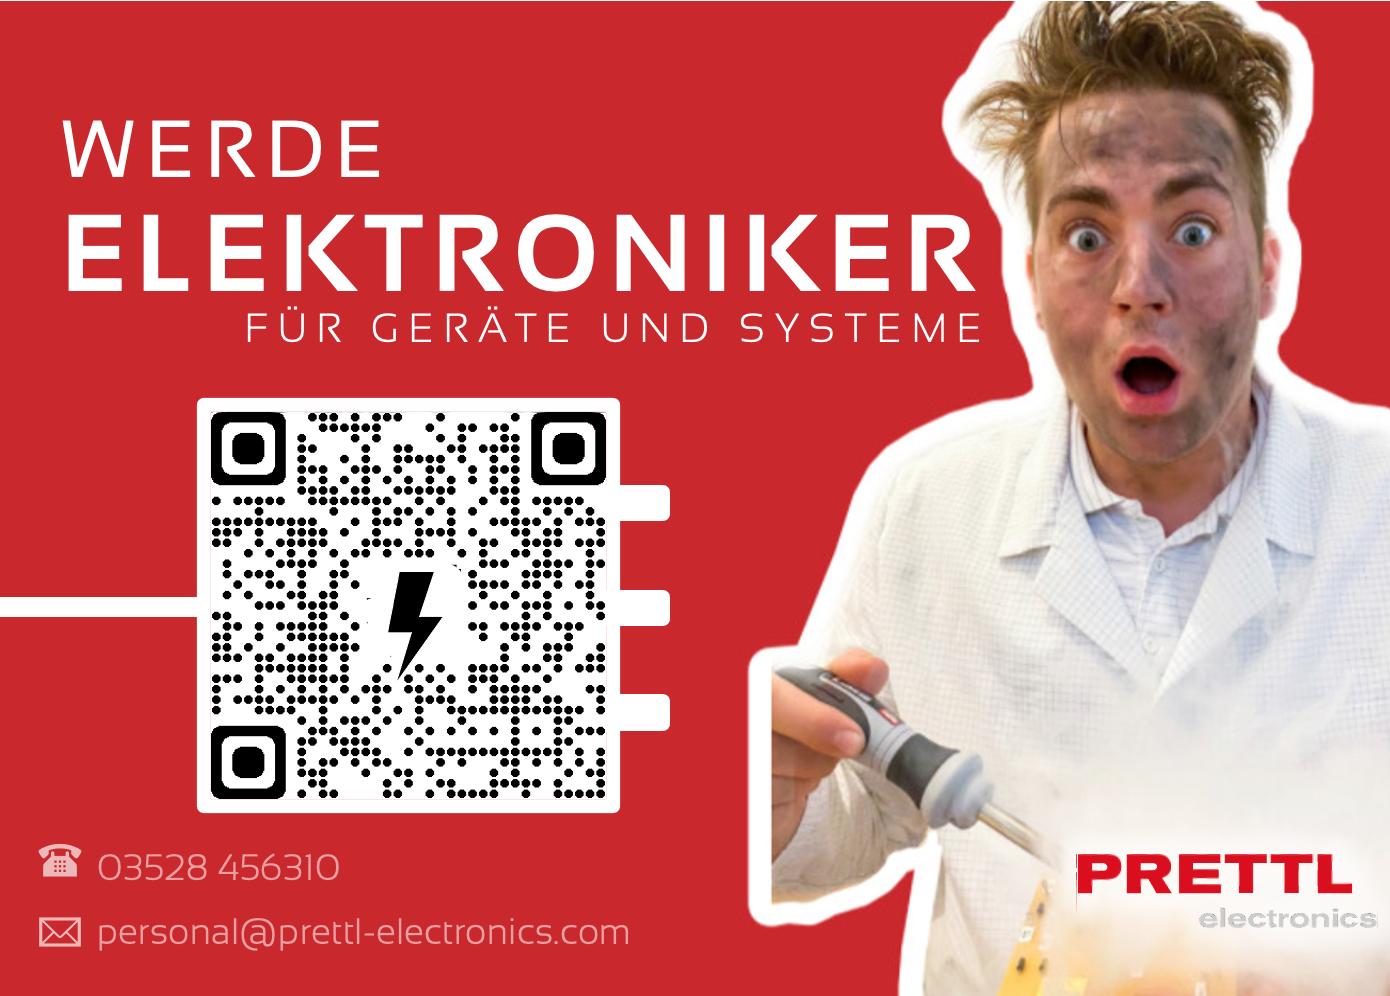 PRETTL ELECTRONICS